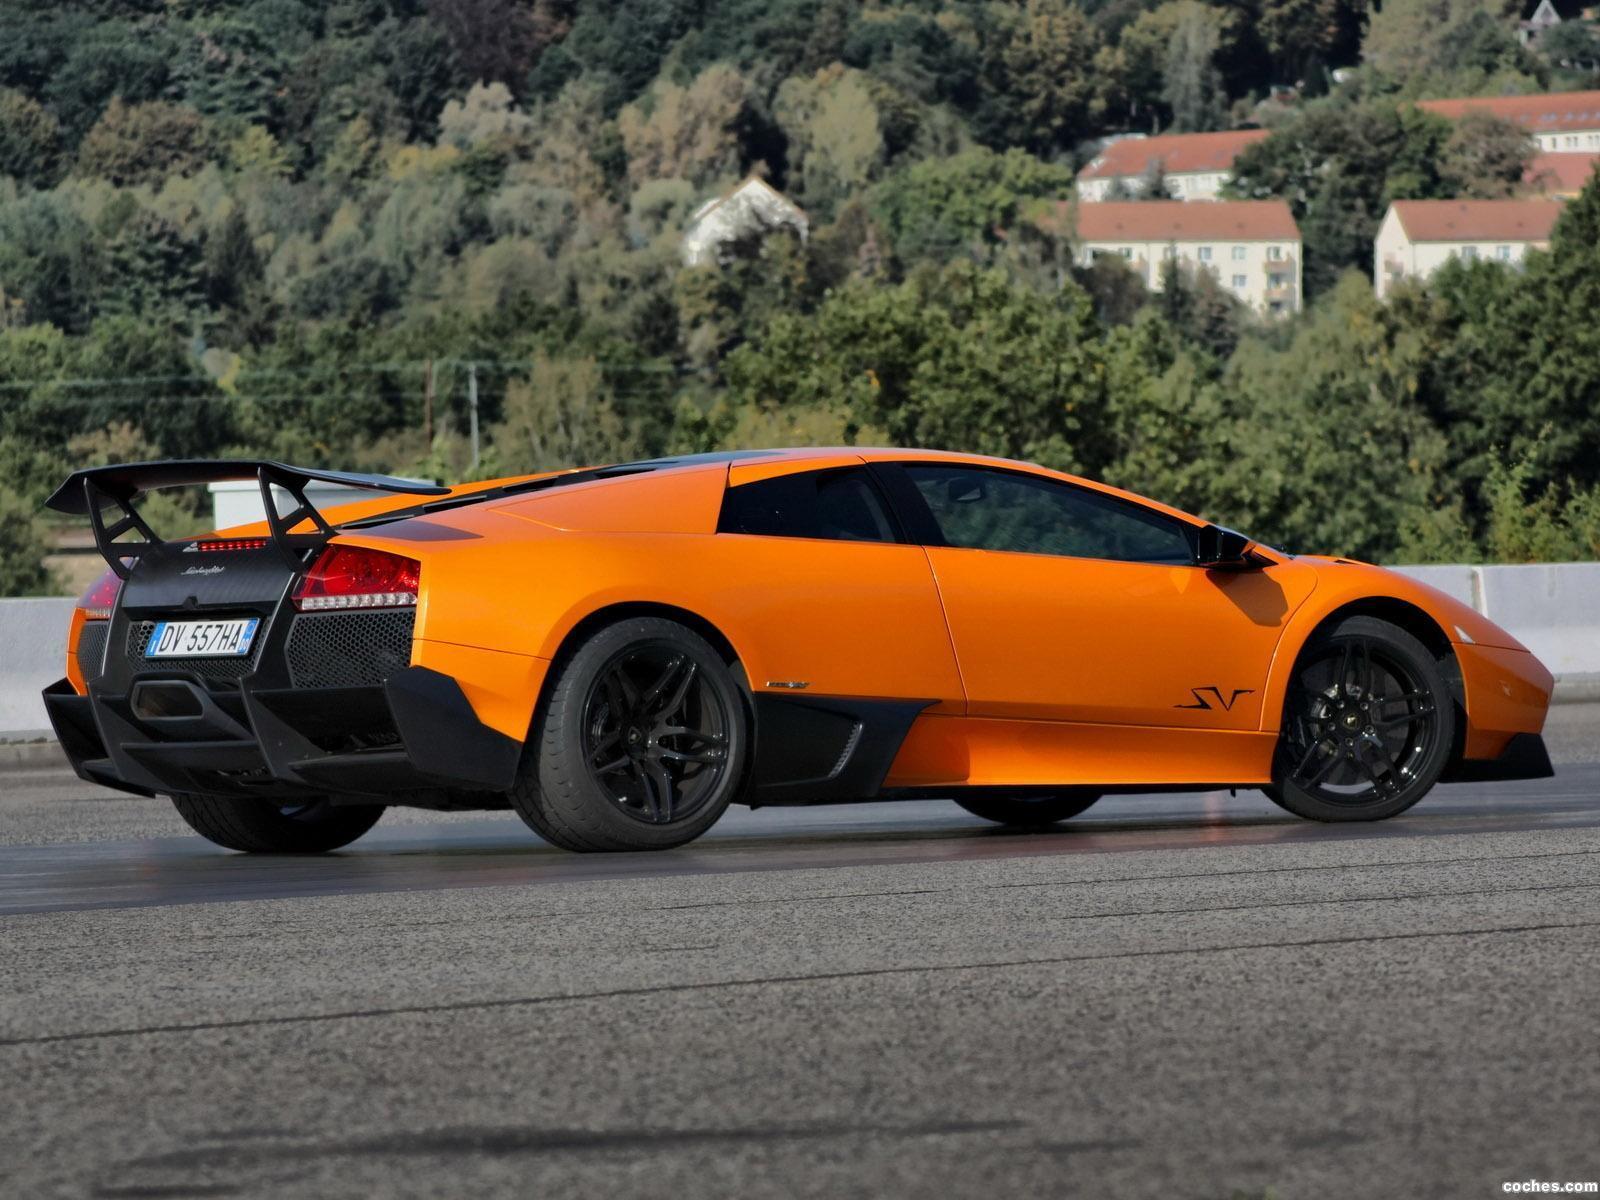 Foto 2 de Lamborghini Murcielago LP670-4 SV Premier4509 2010